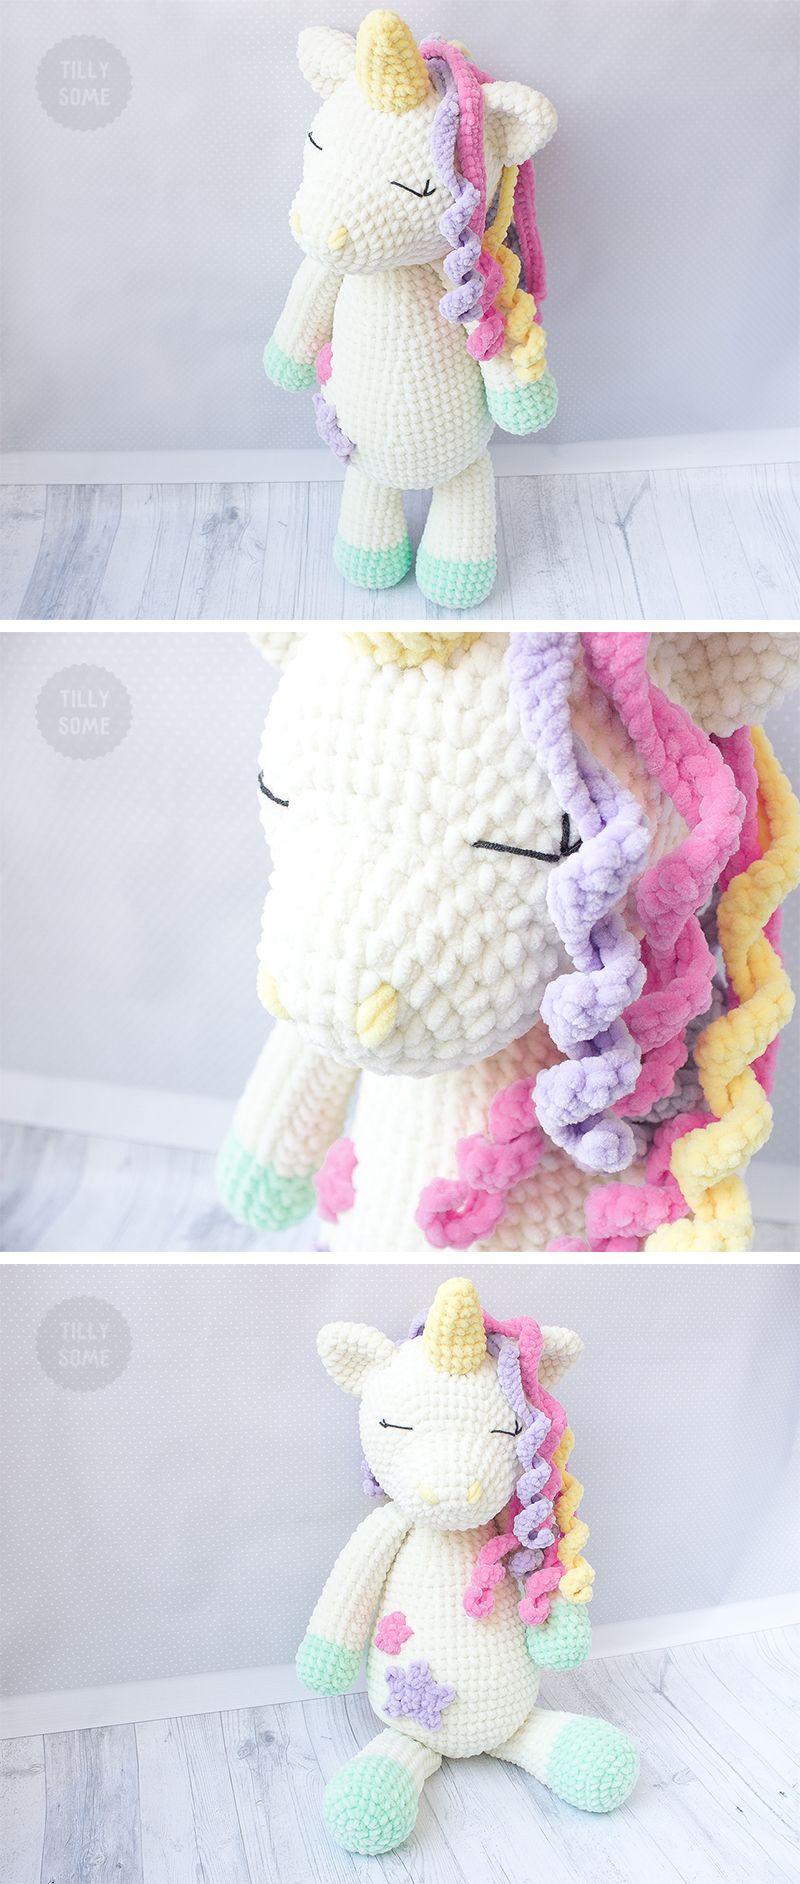 DIY: Haarknoten für Amigurumi-Puppe häkeln - YouTube | 1884x800